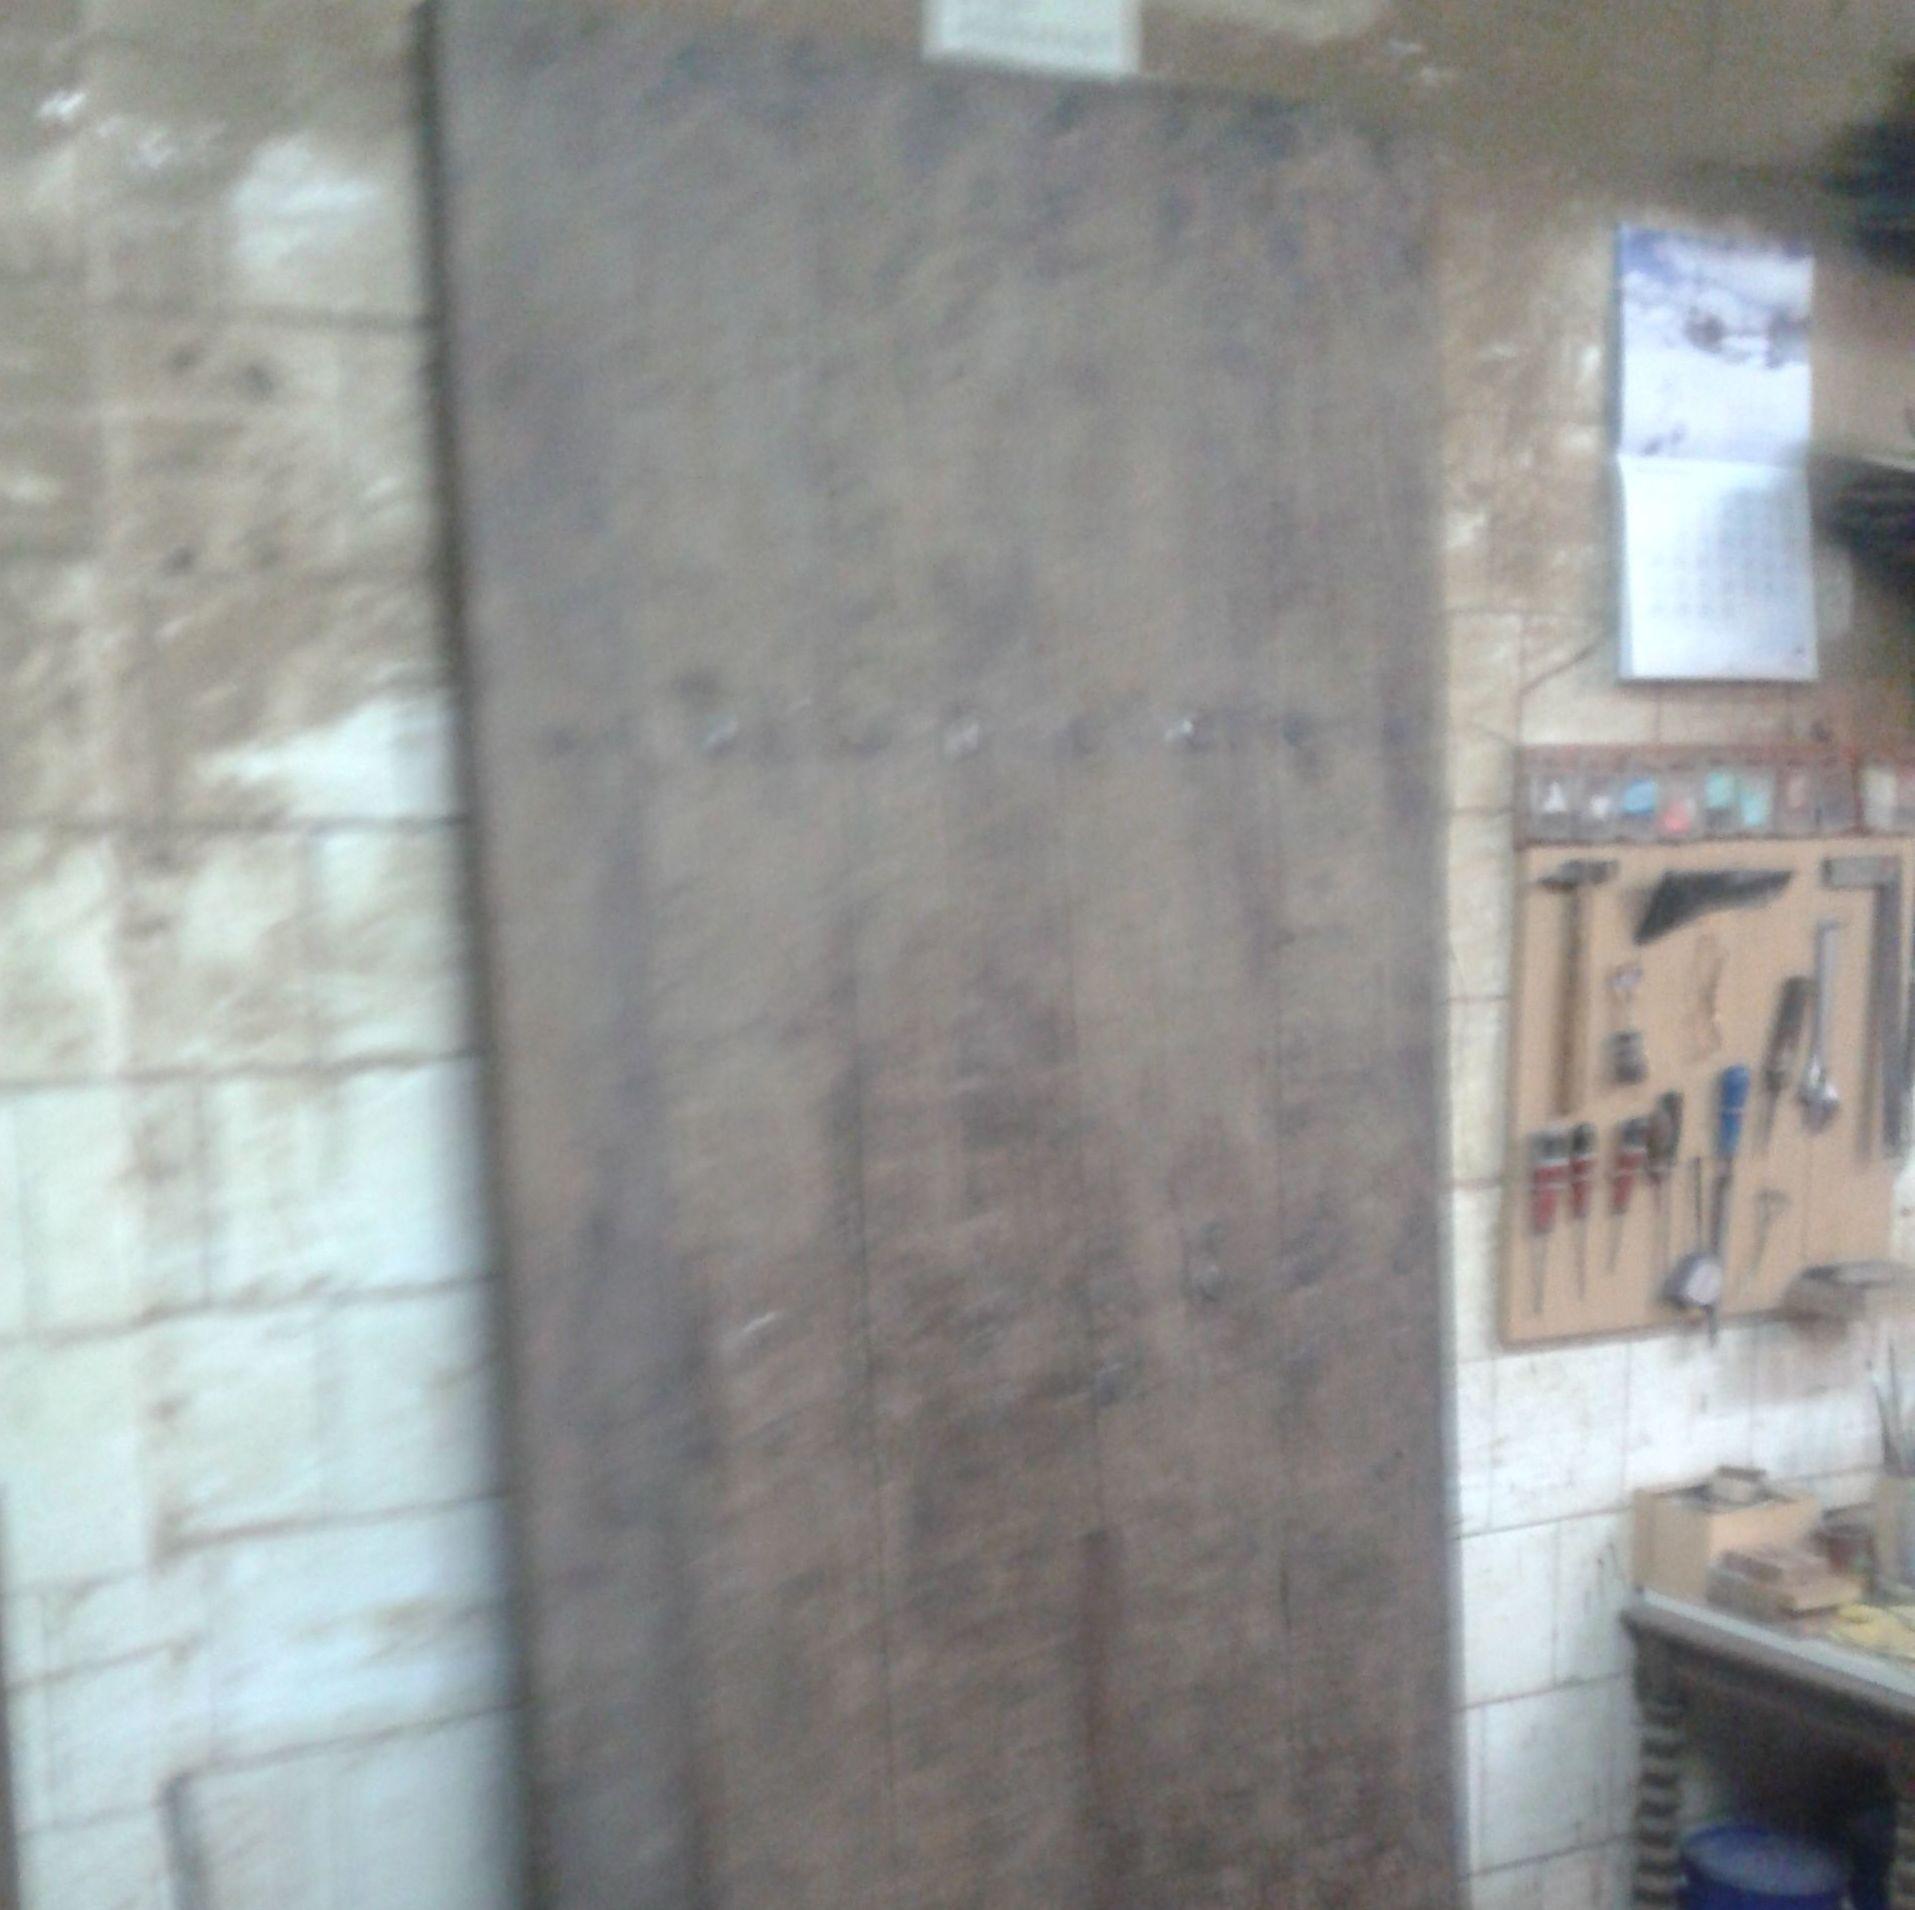 Foto 69 de Restauración de muebles en Pamplona | Lendik Restauración